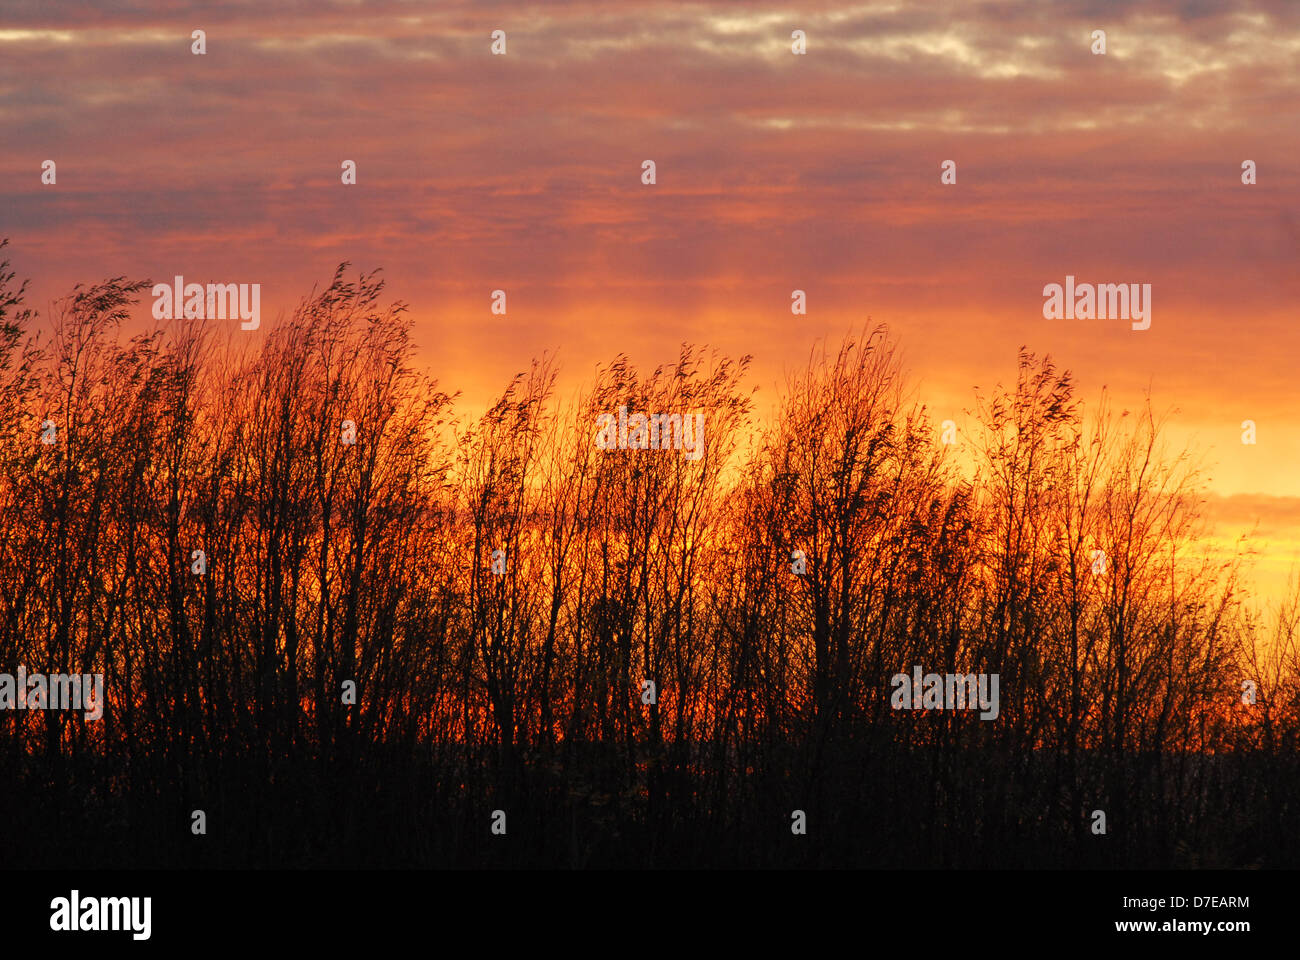 Winter sunset through leafless trees near the old Siberian town Tobolsk. Russia - Stock Image